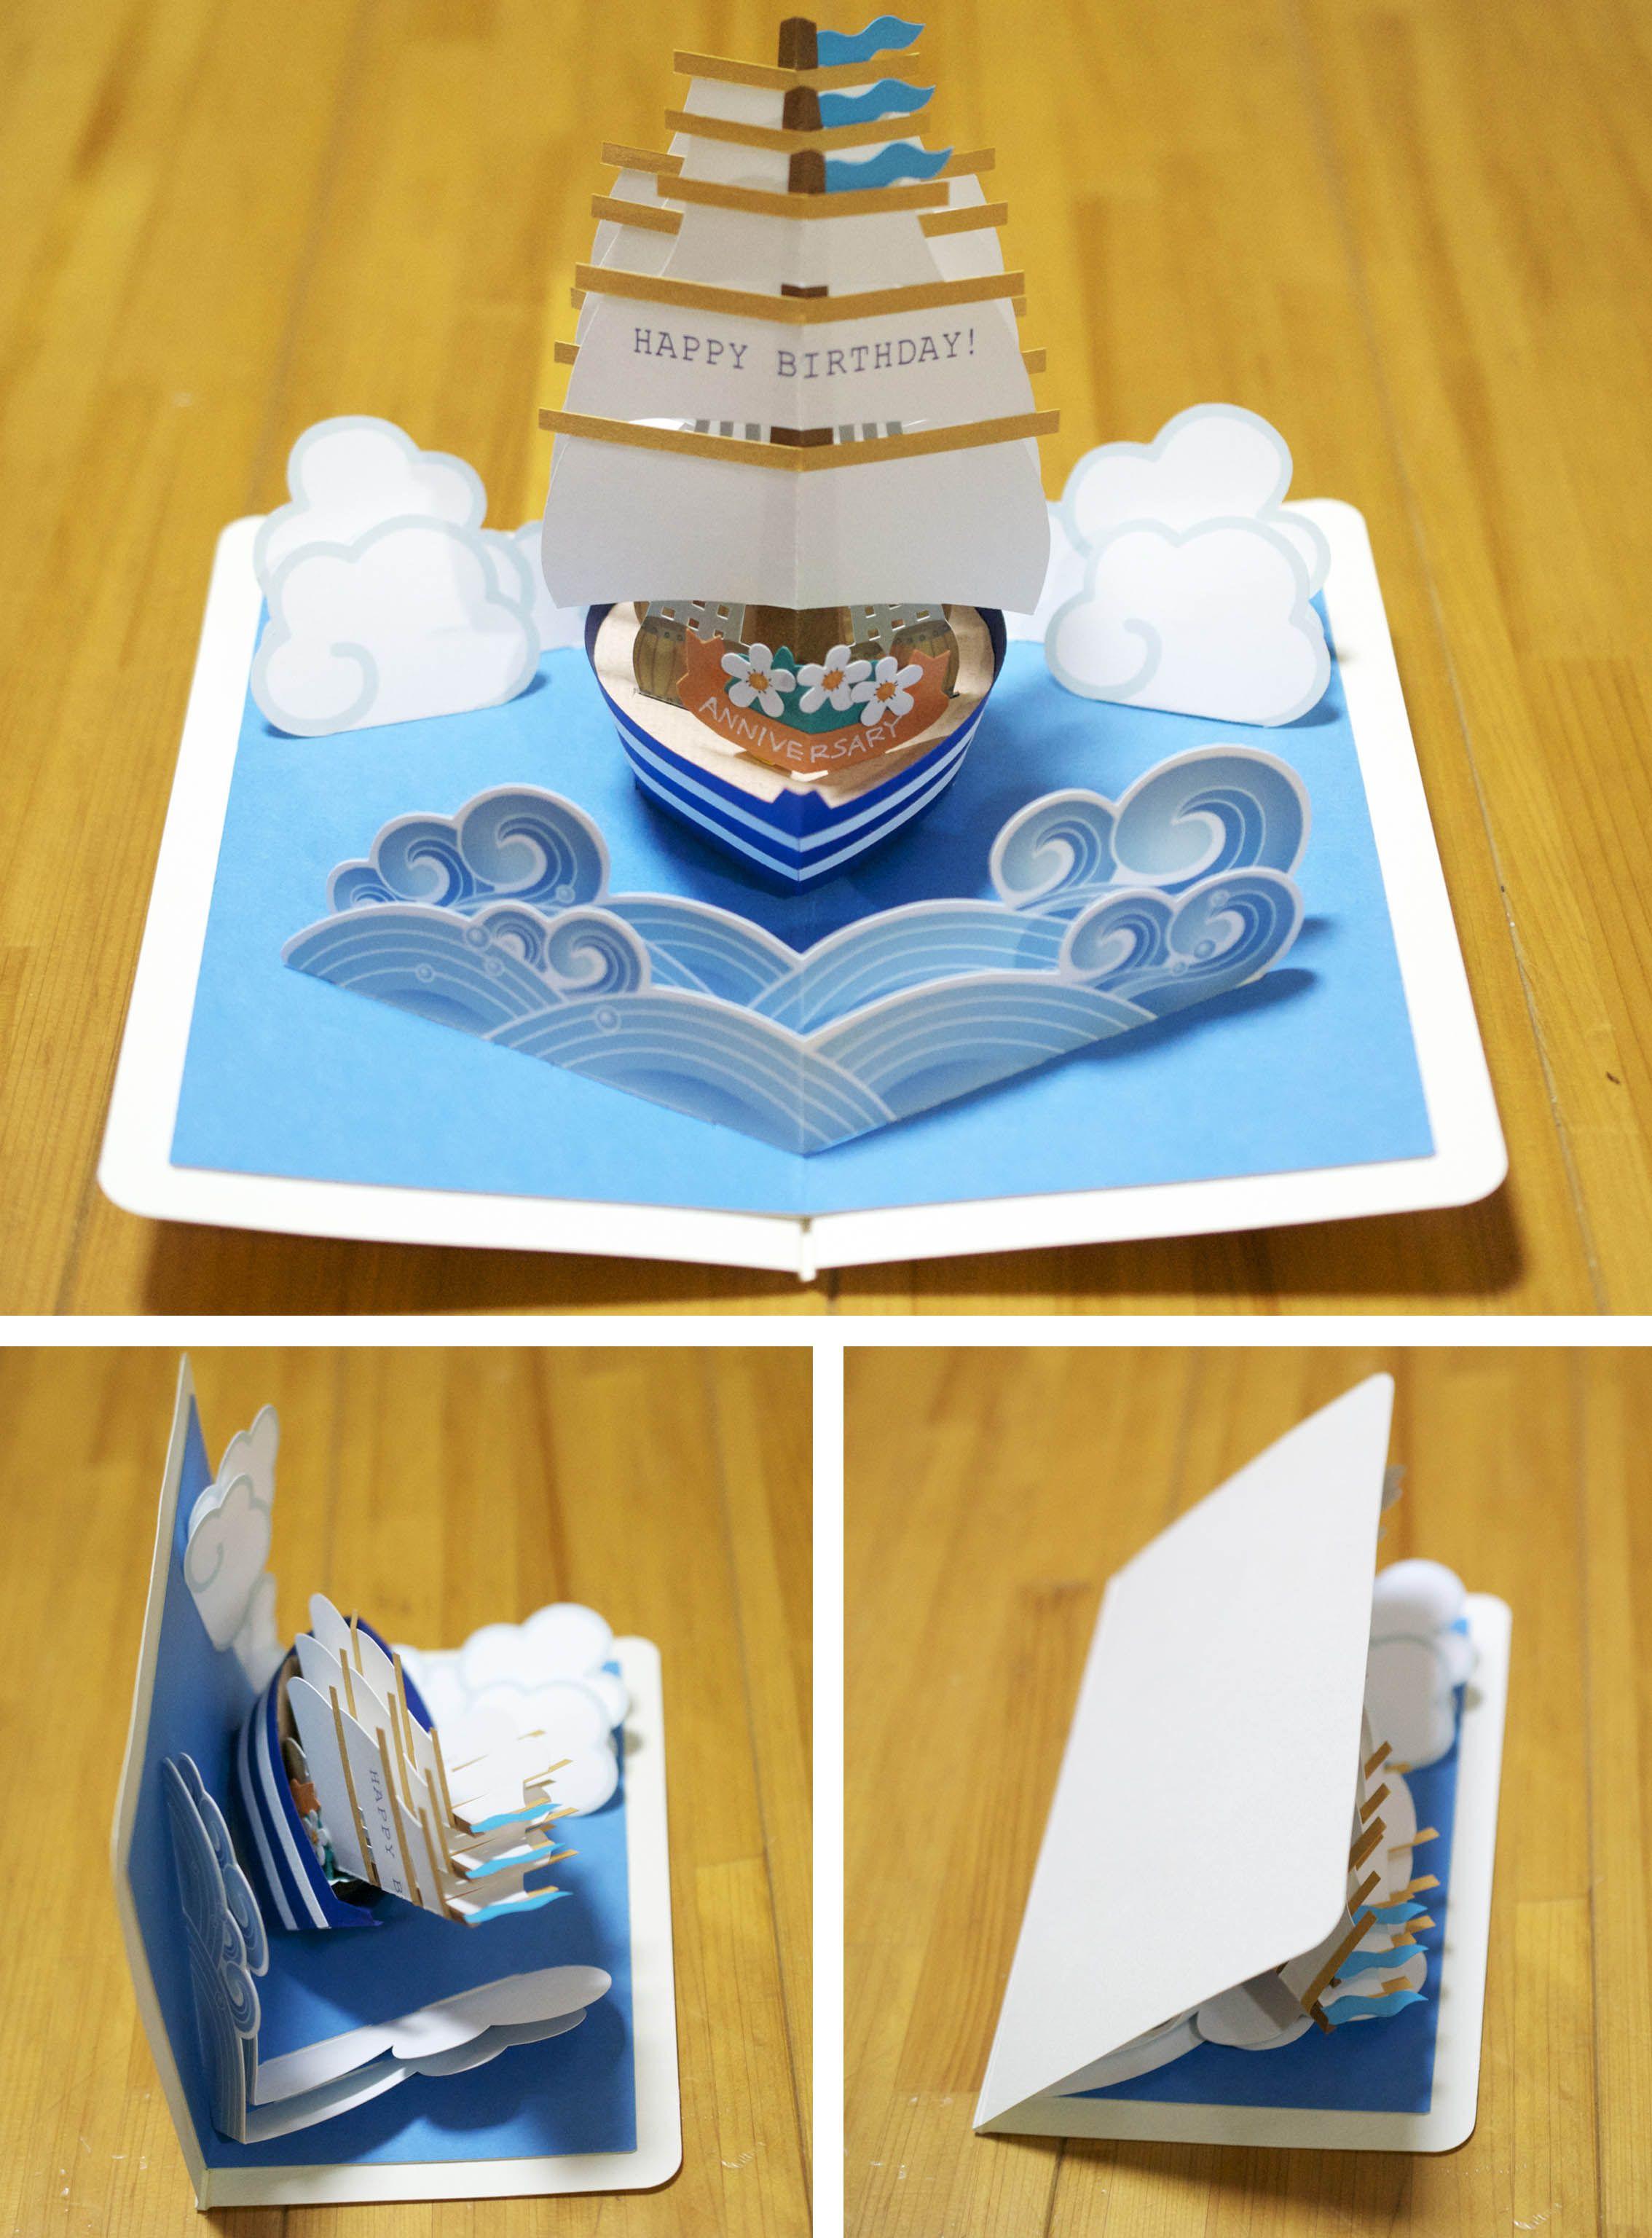 pop-up card [sailing ship] original handmade by Kagisippo. ------------------------- [Youtube]  http://youtu.be/_JljNMU5gtU